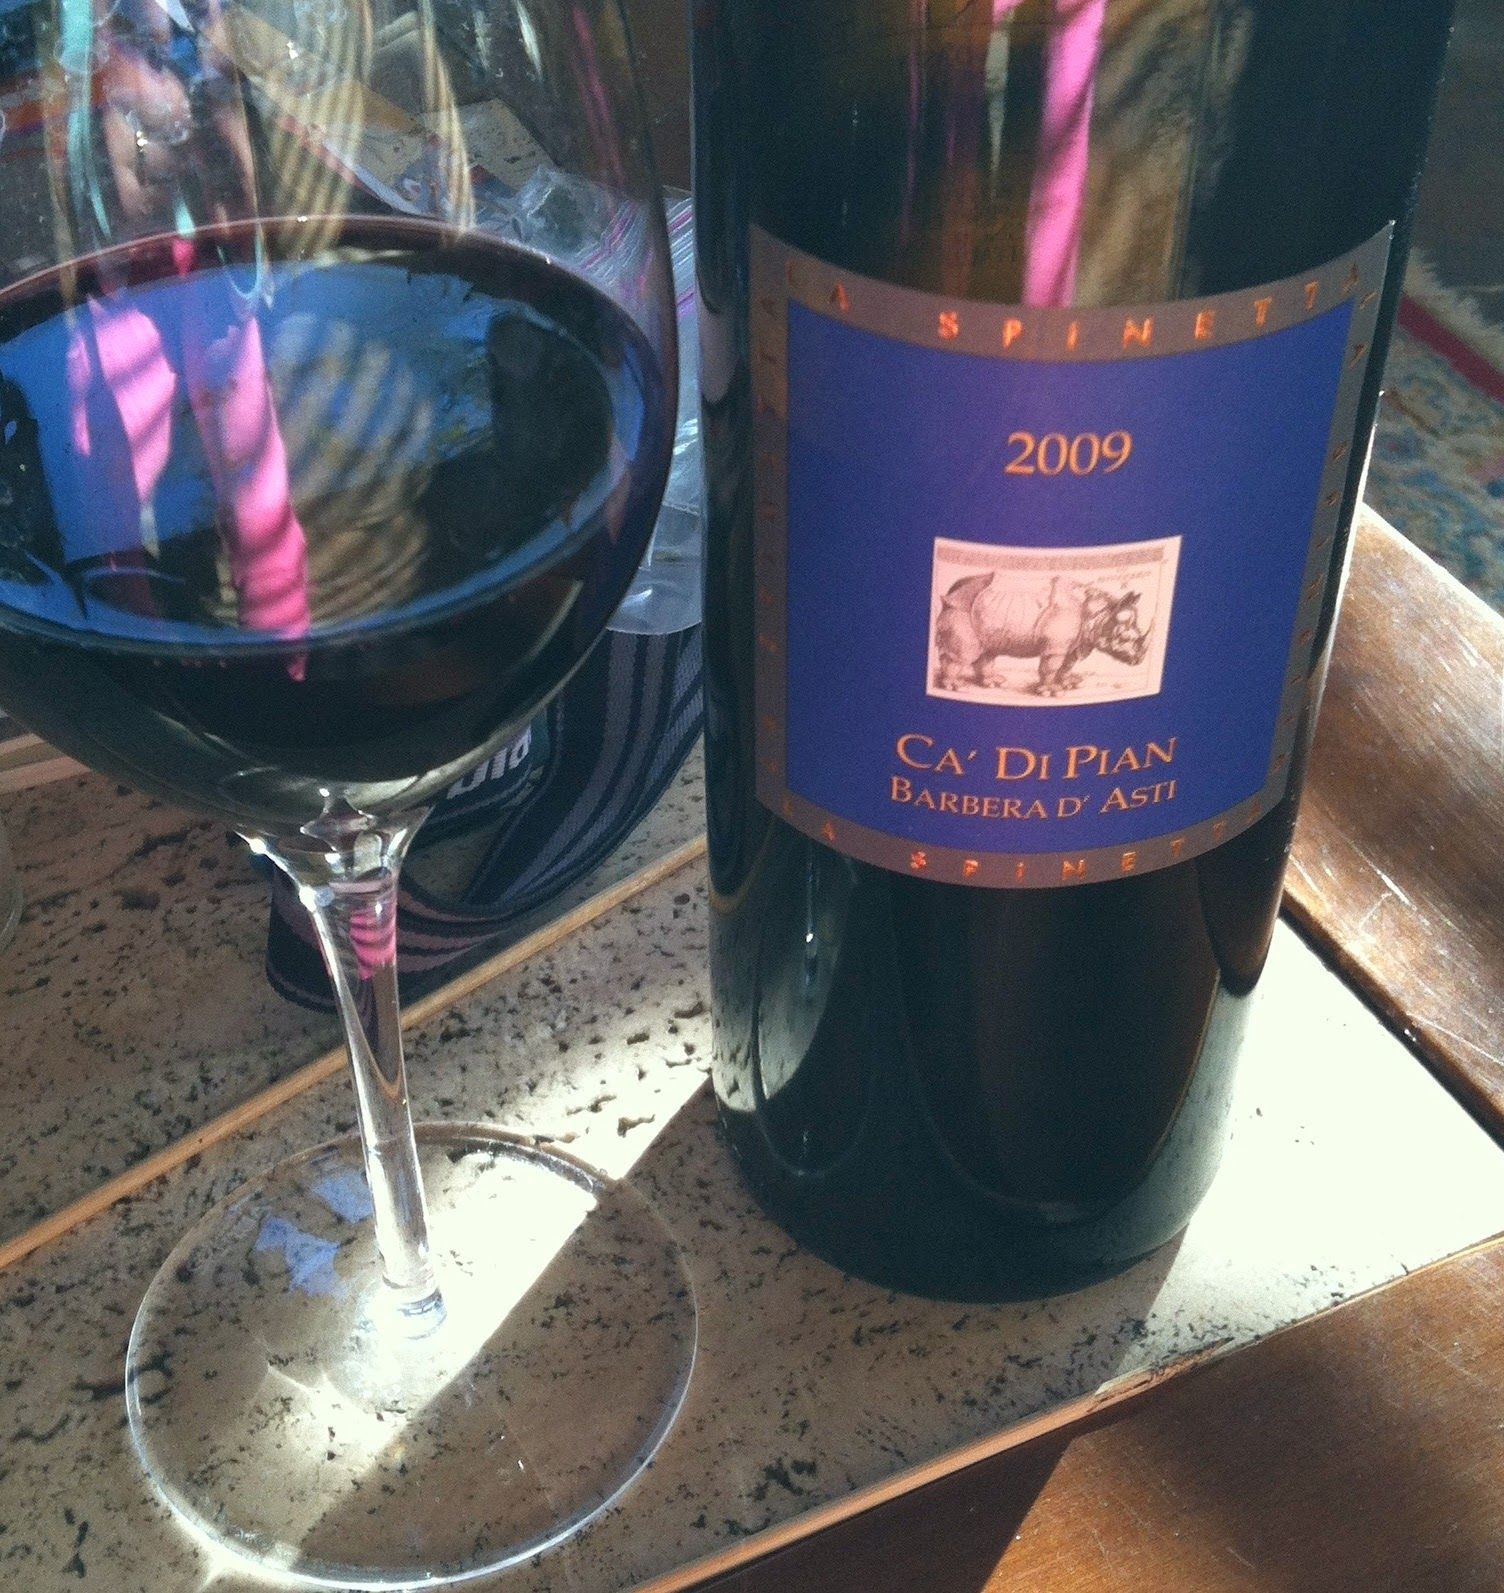 La Spinetta Barbera d'Asti 2009   Wine Review